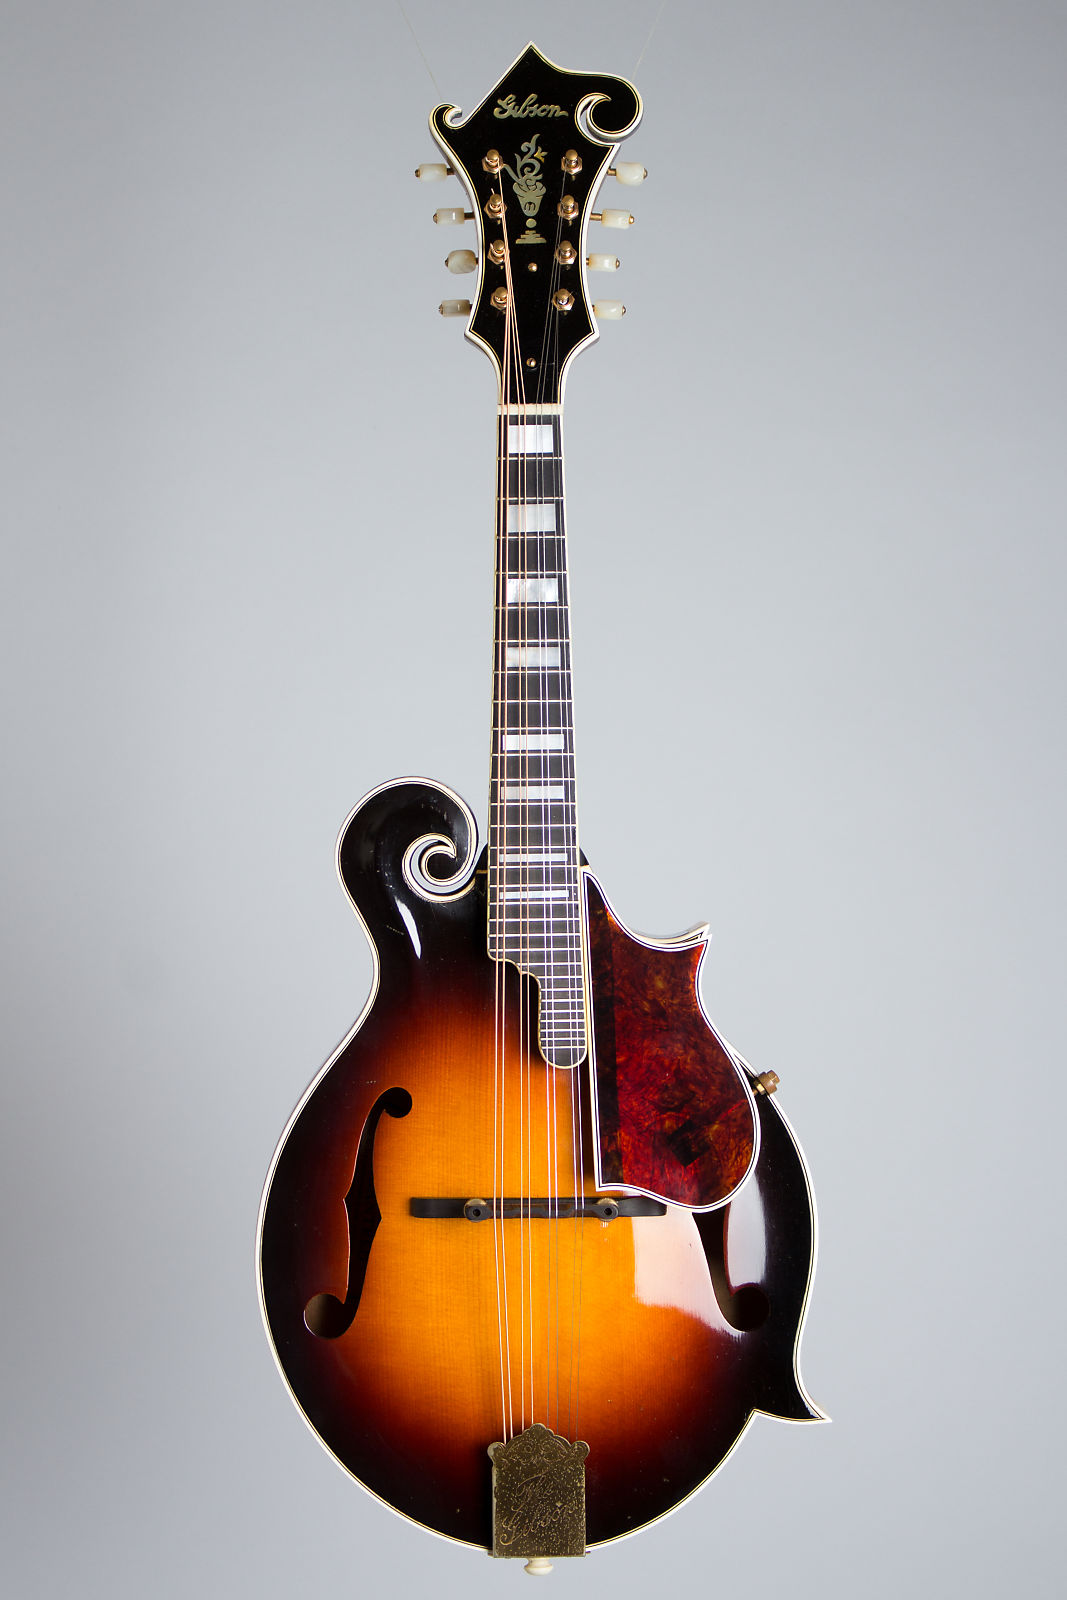 Gibson  F-5 Carved Top Mandolin (1938), ser. #95361, original black hard shell case.